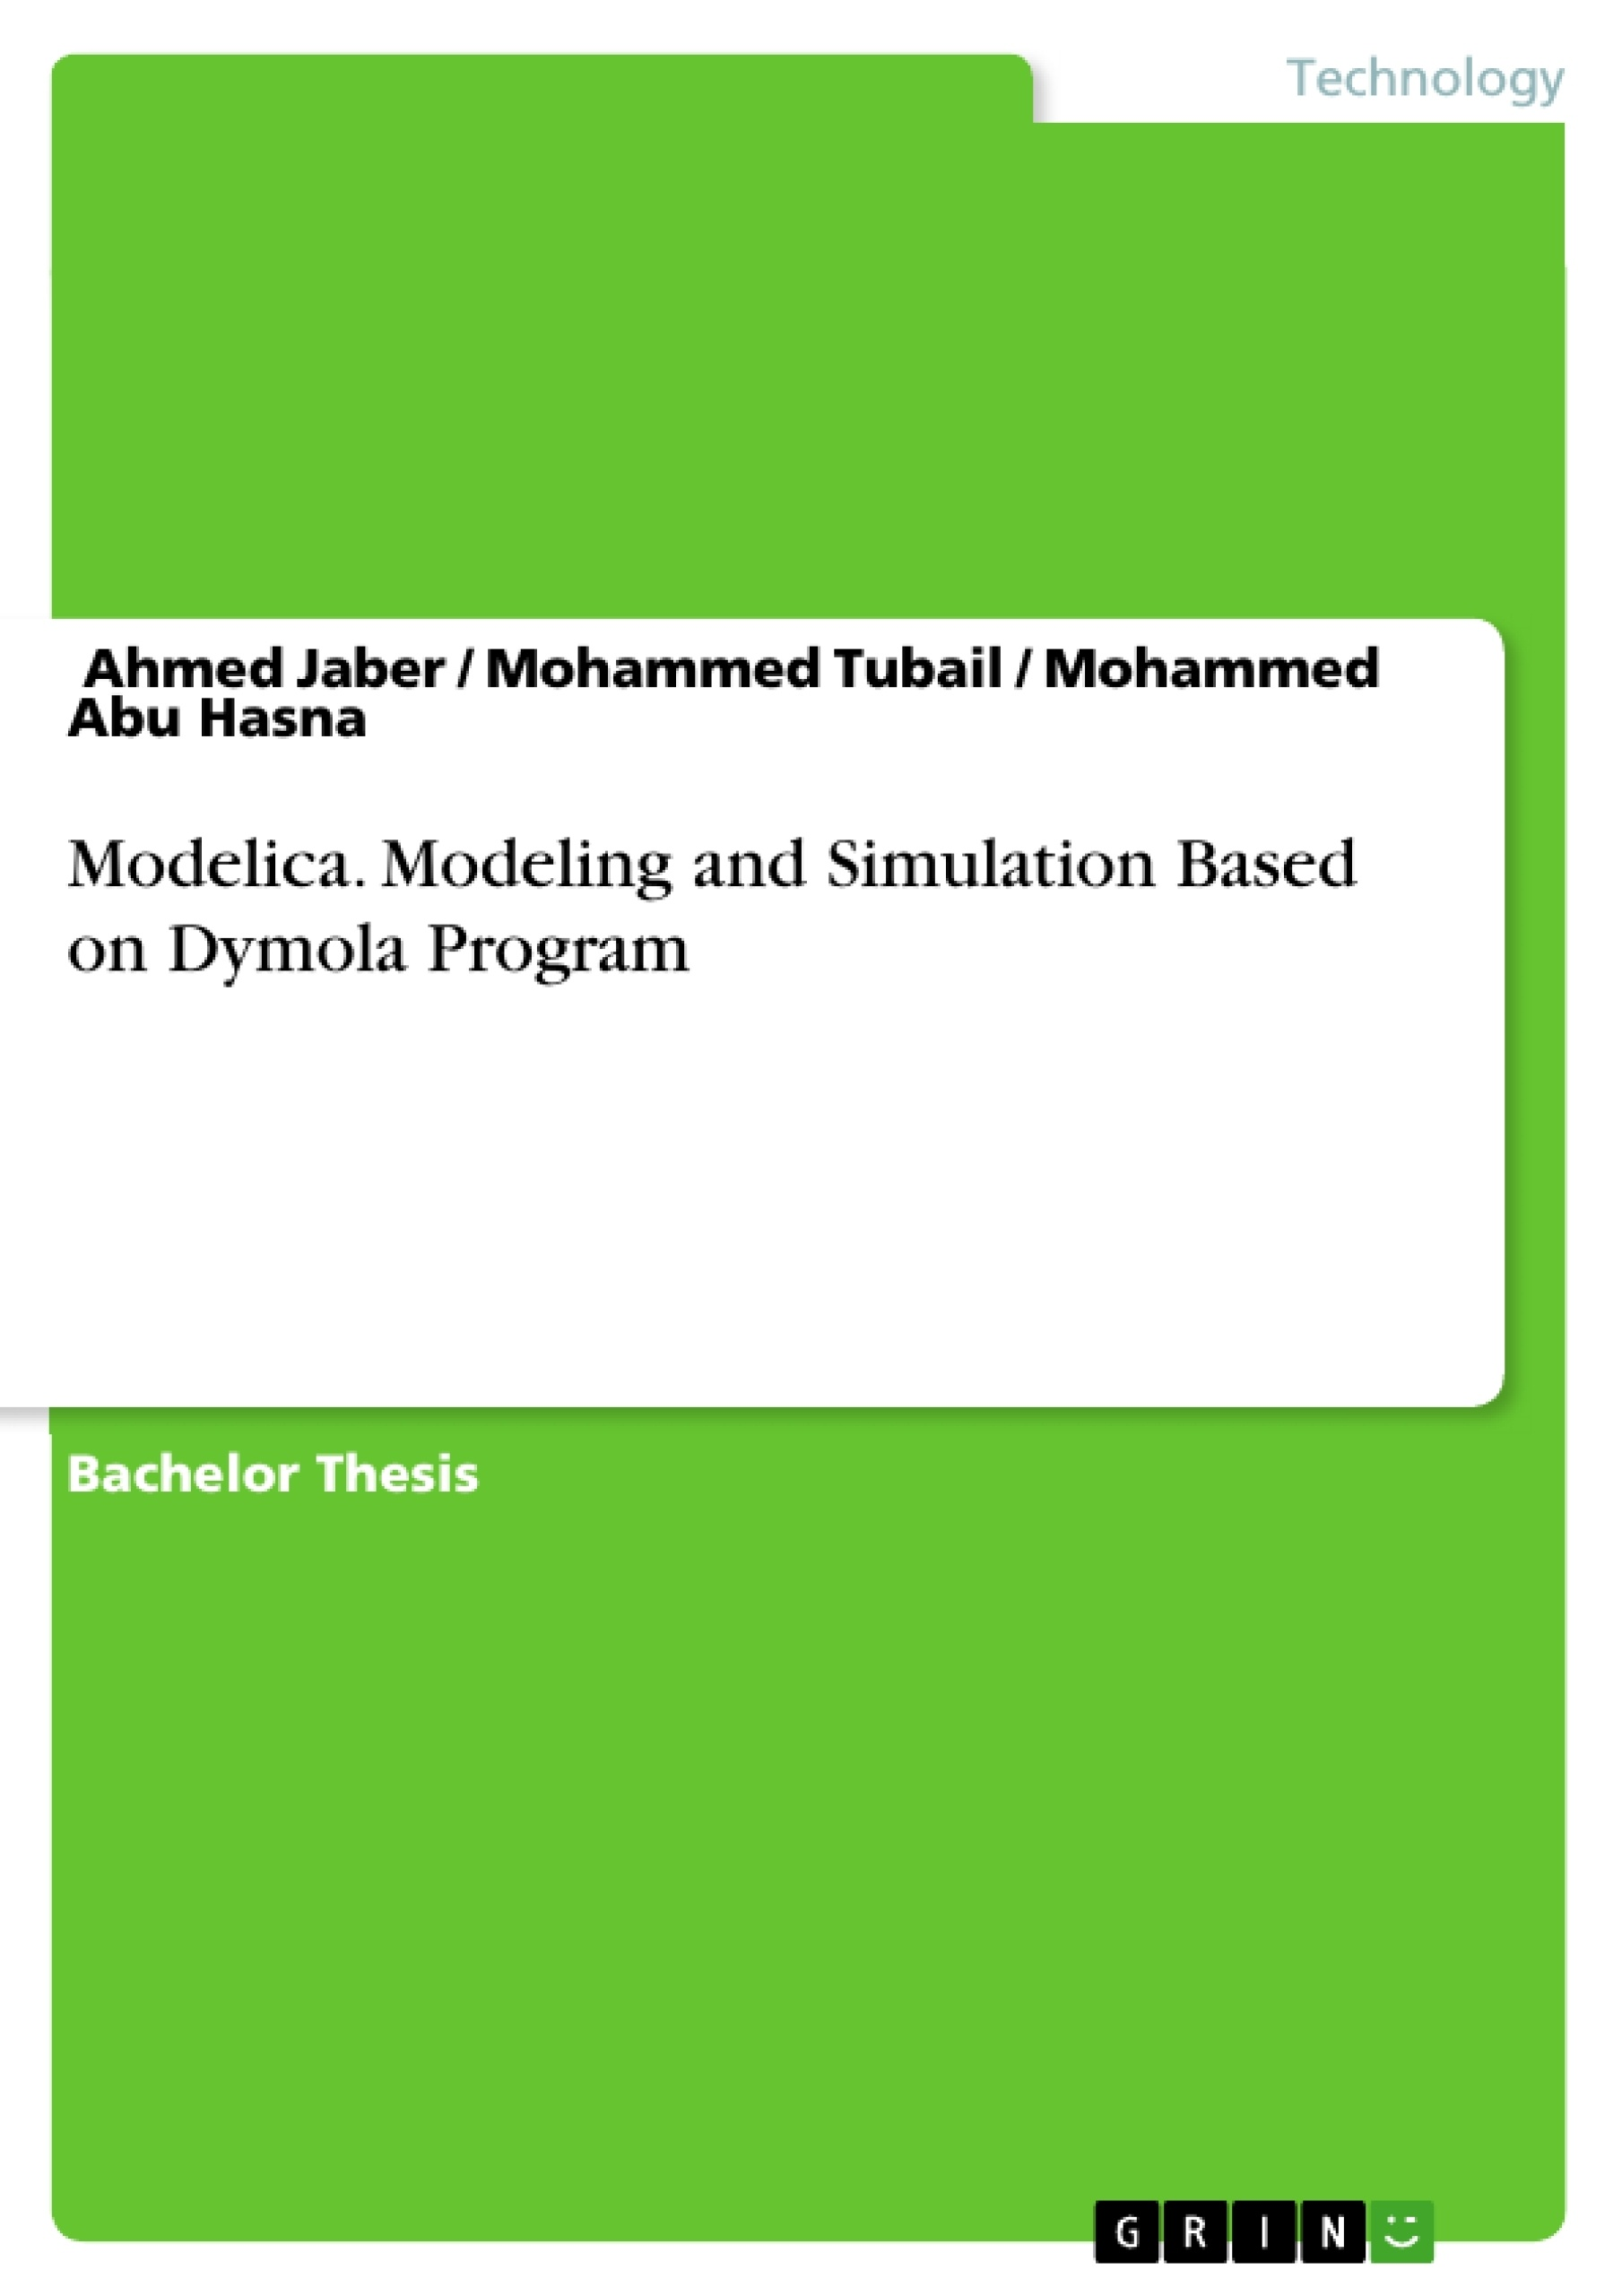 Title: Modelica. Modeling and Simulation Based on Dymola Program